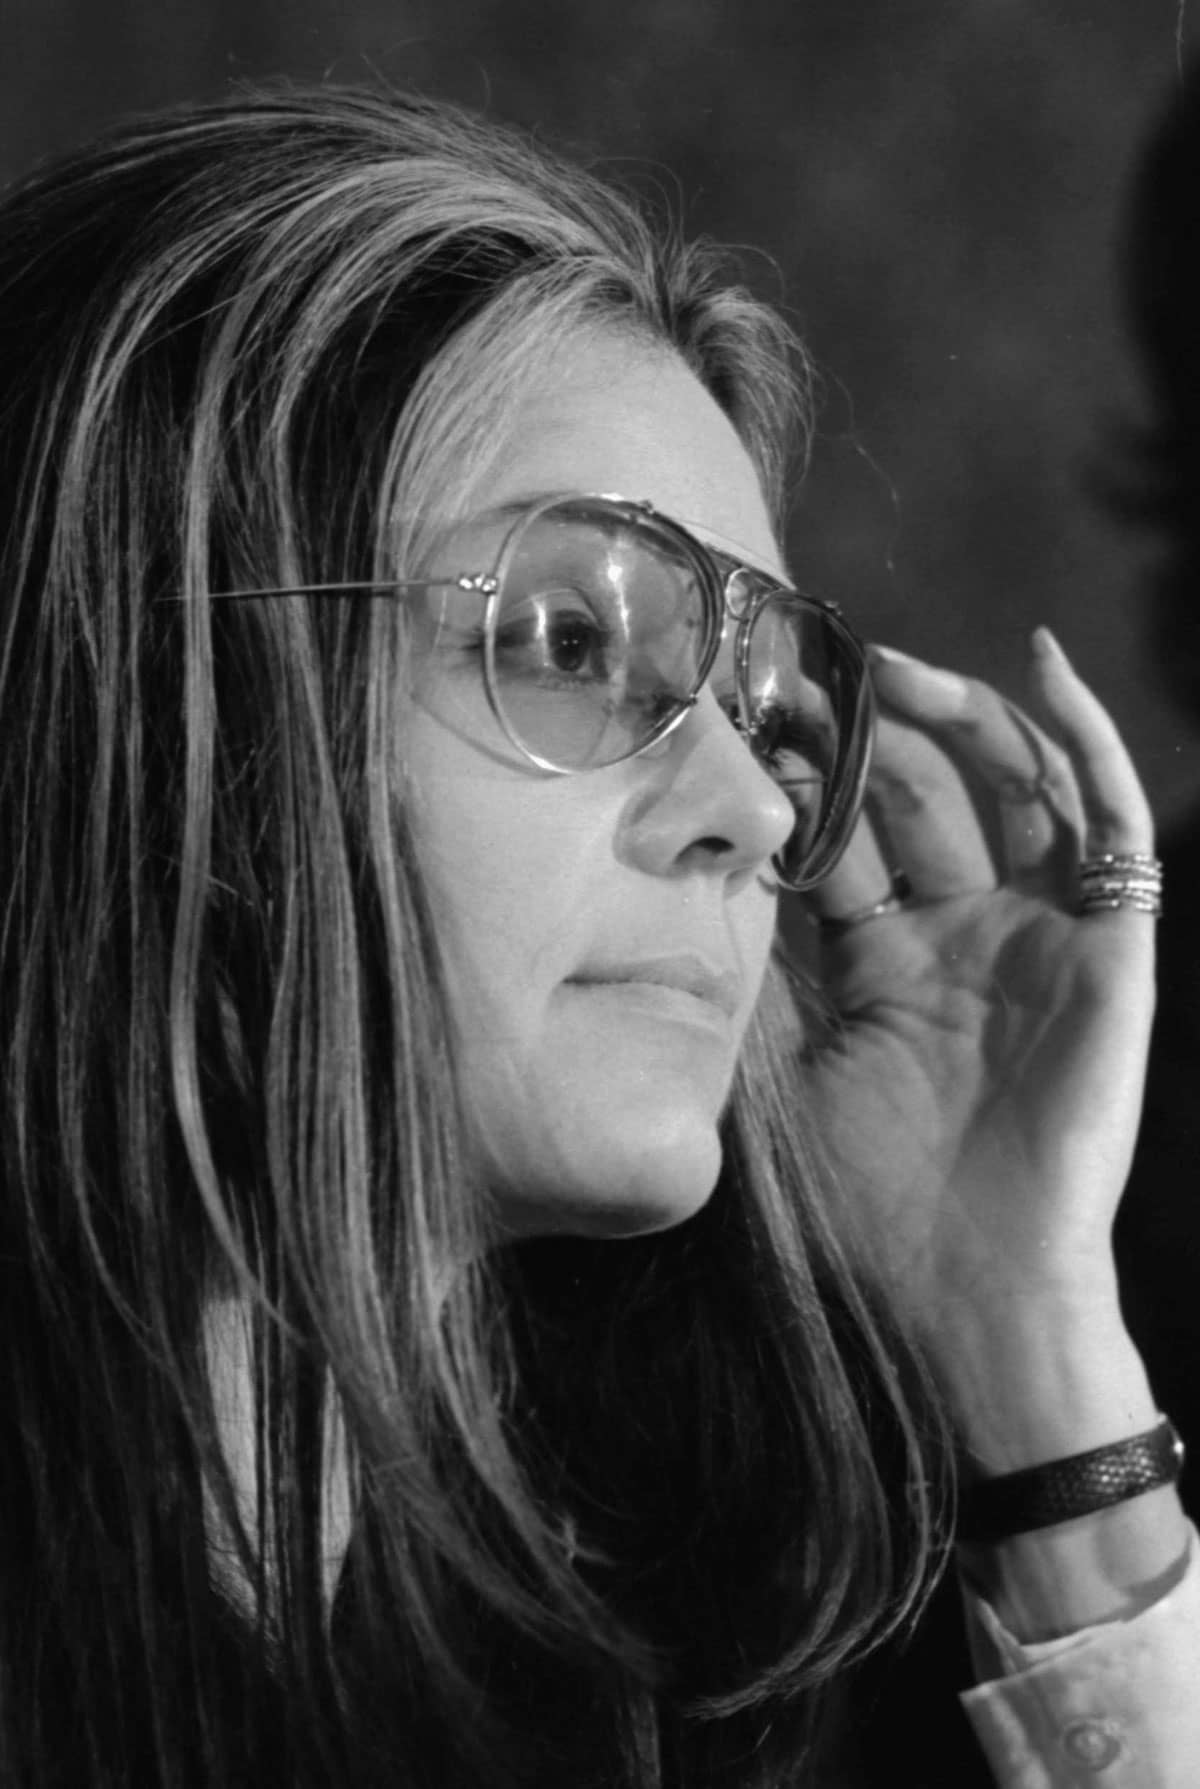 Gloria Steinheim et ses lunettes XL, 1972